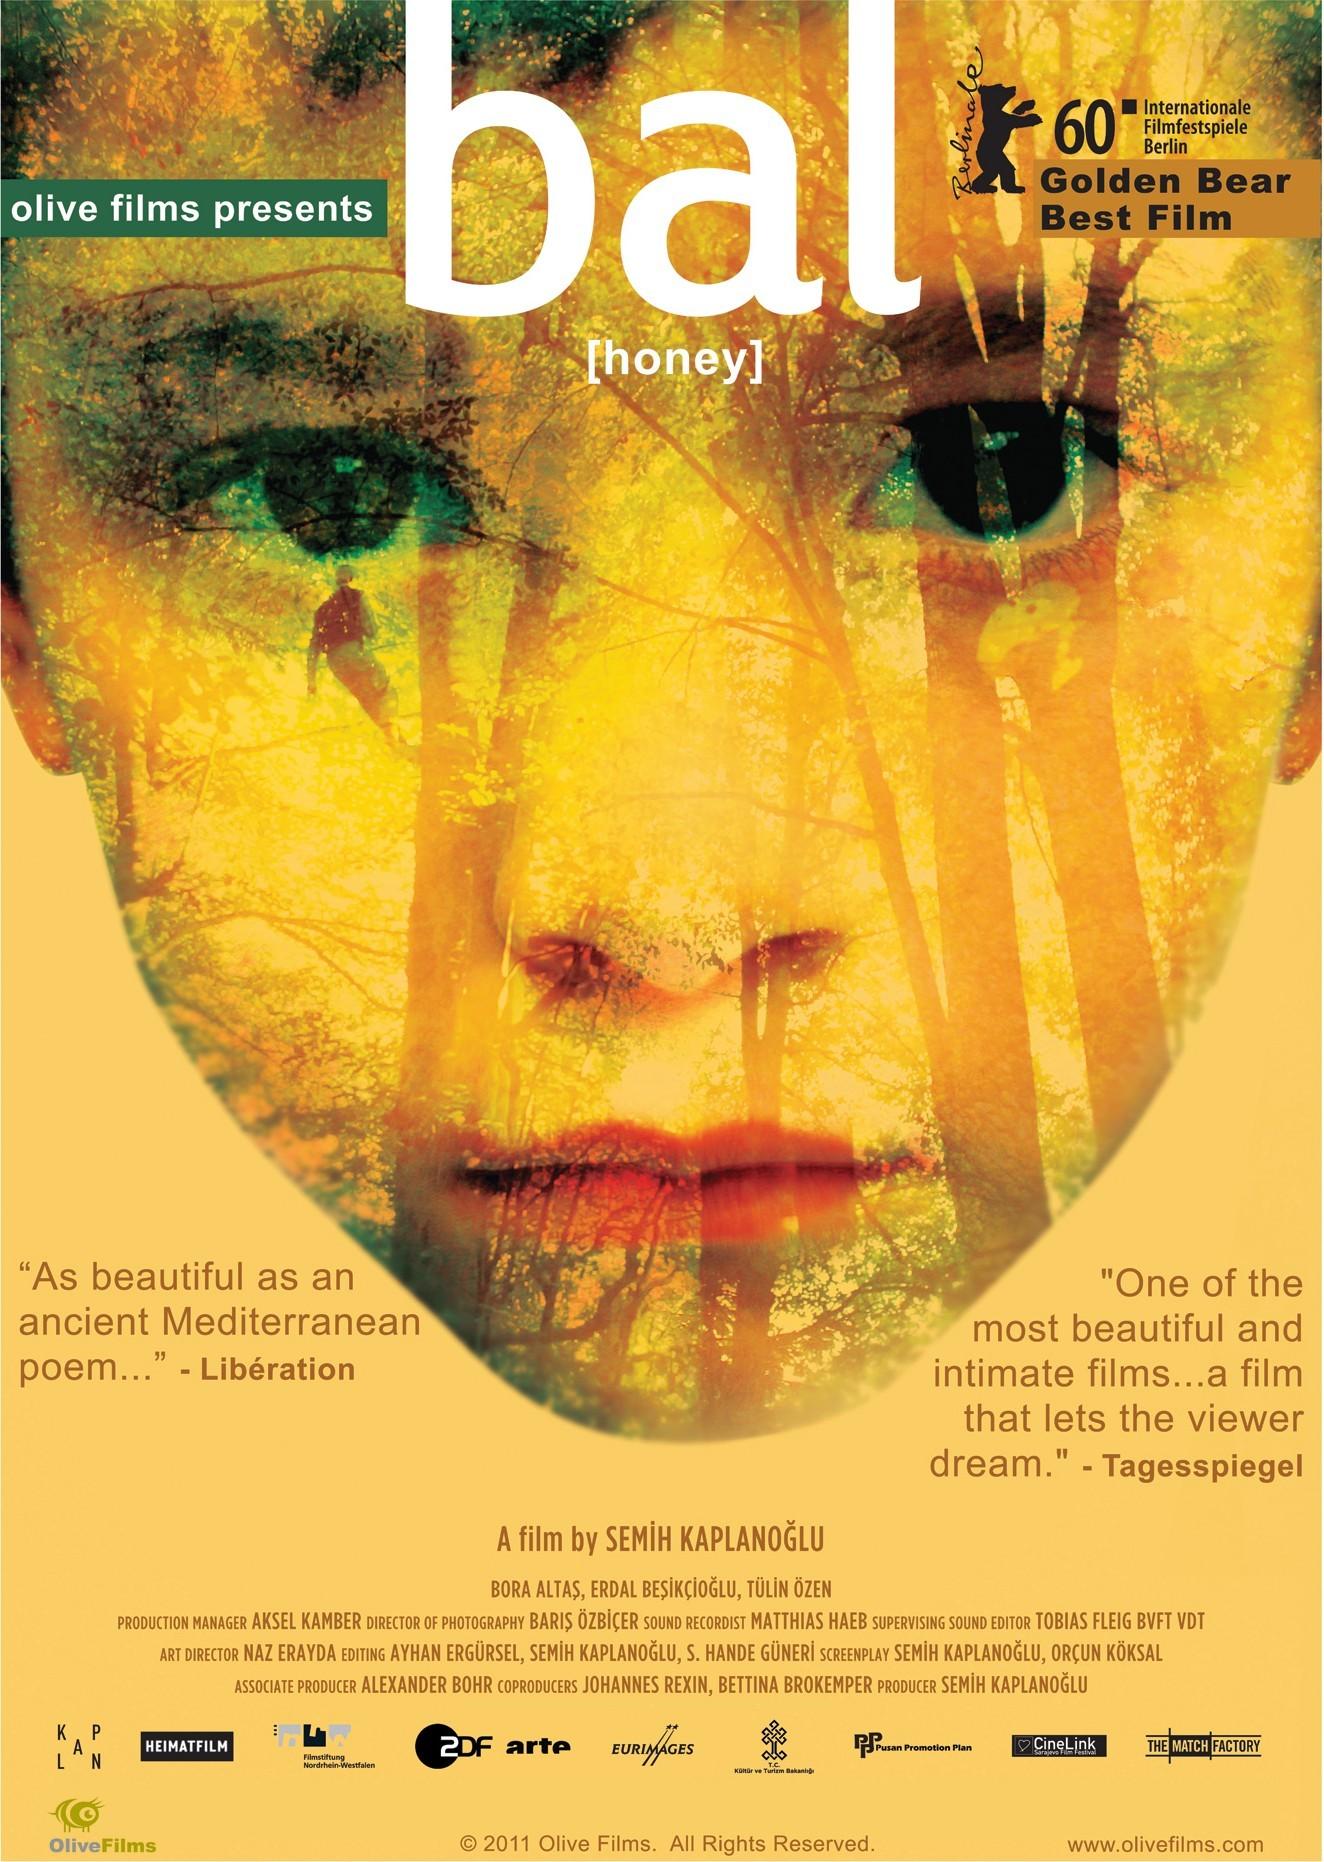 Um Doce Olhar [Dub] – IMDB 7.2